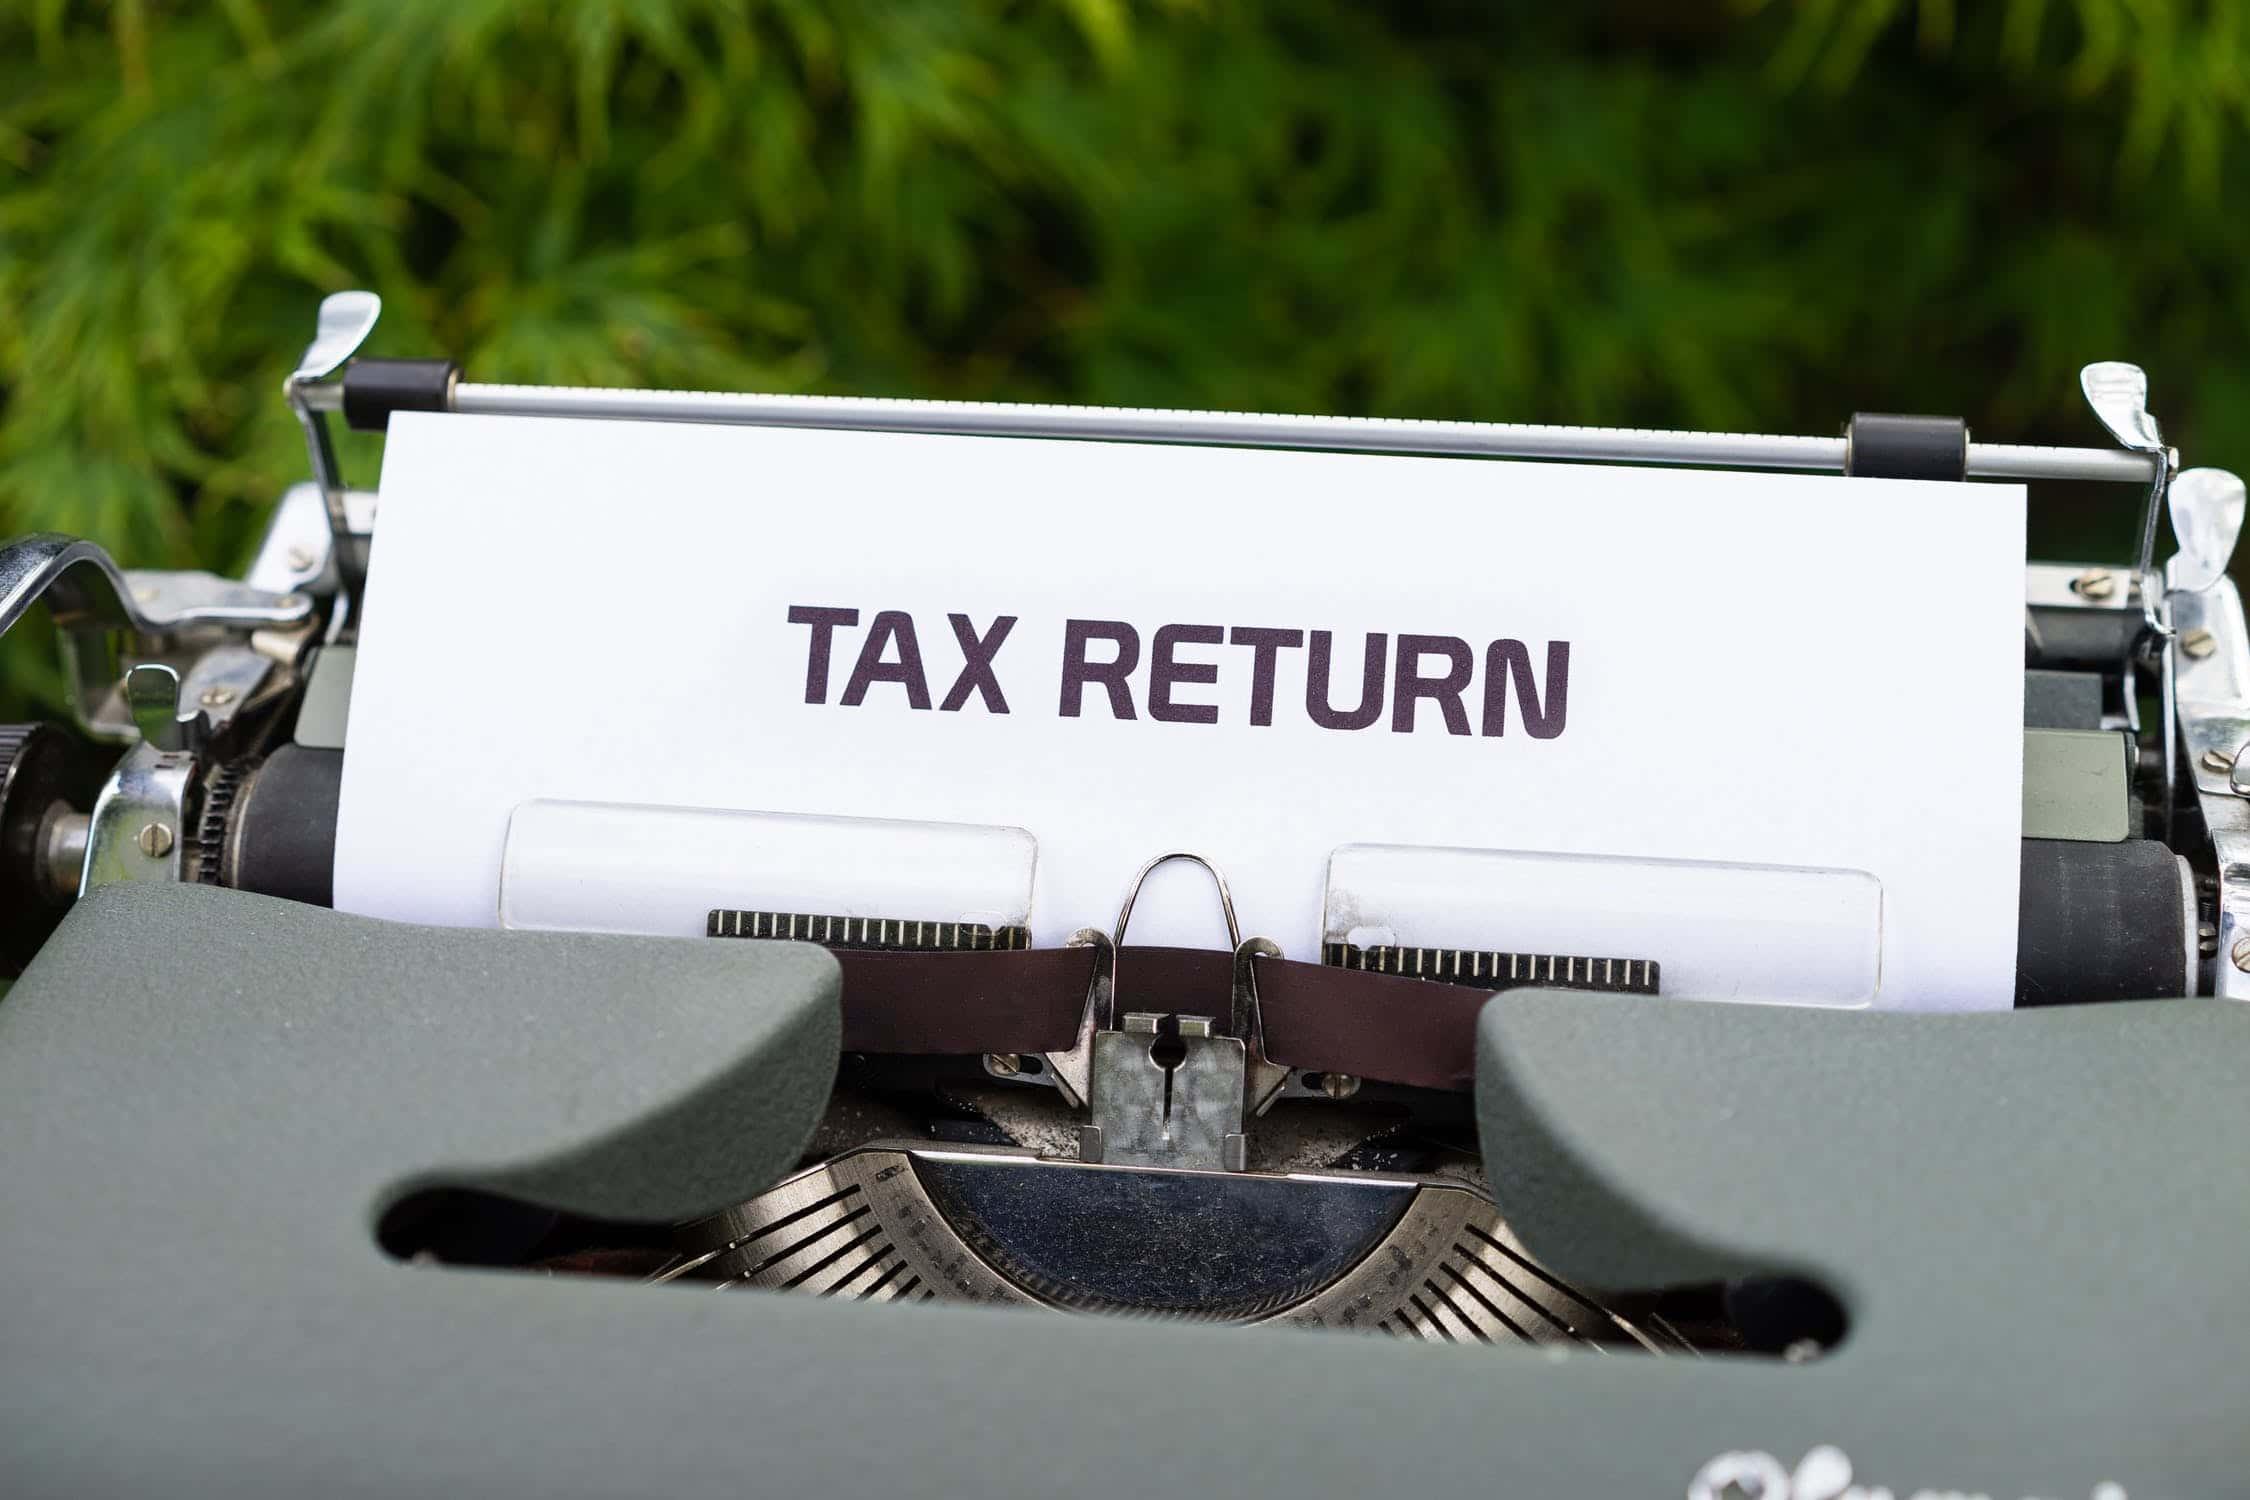 Personal tax preparation